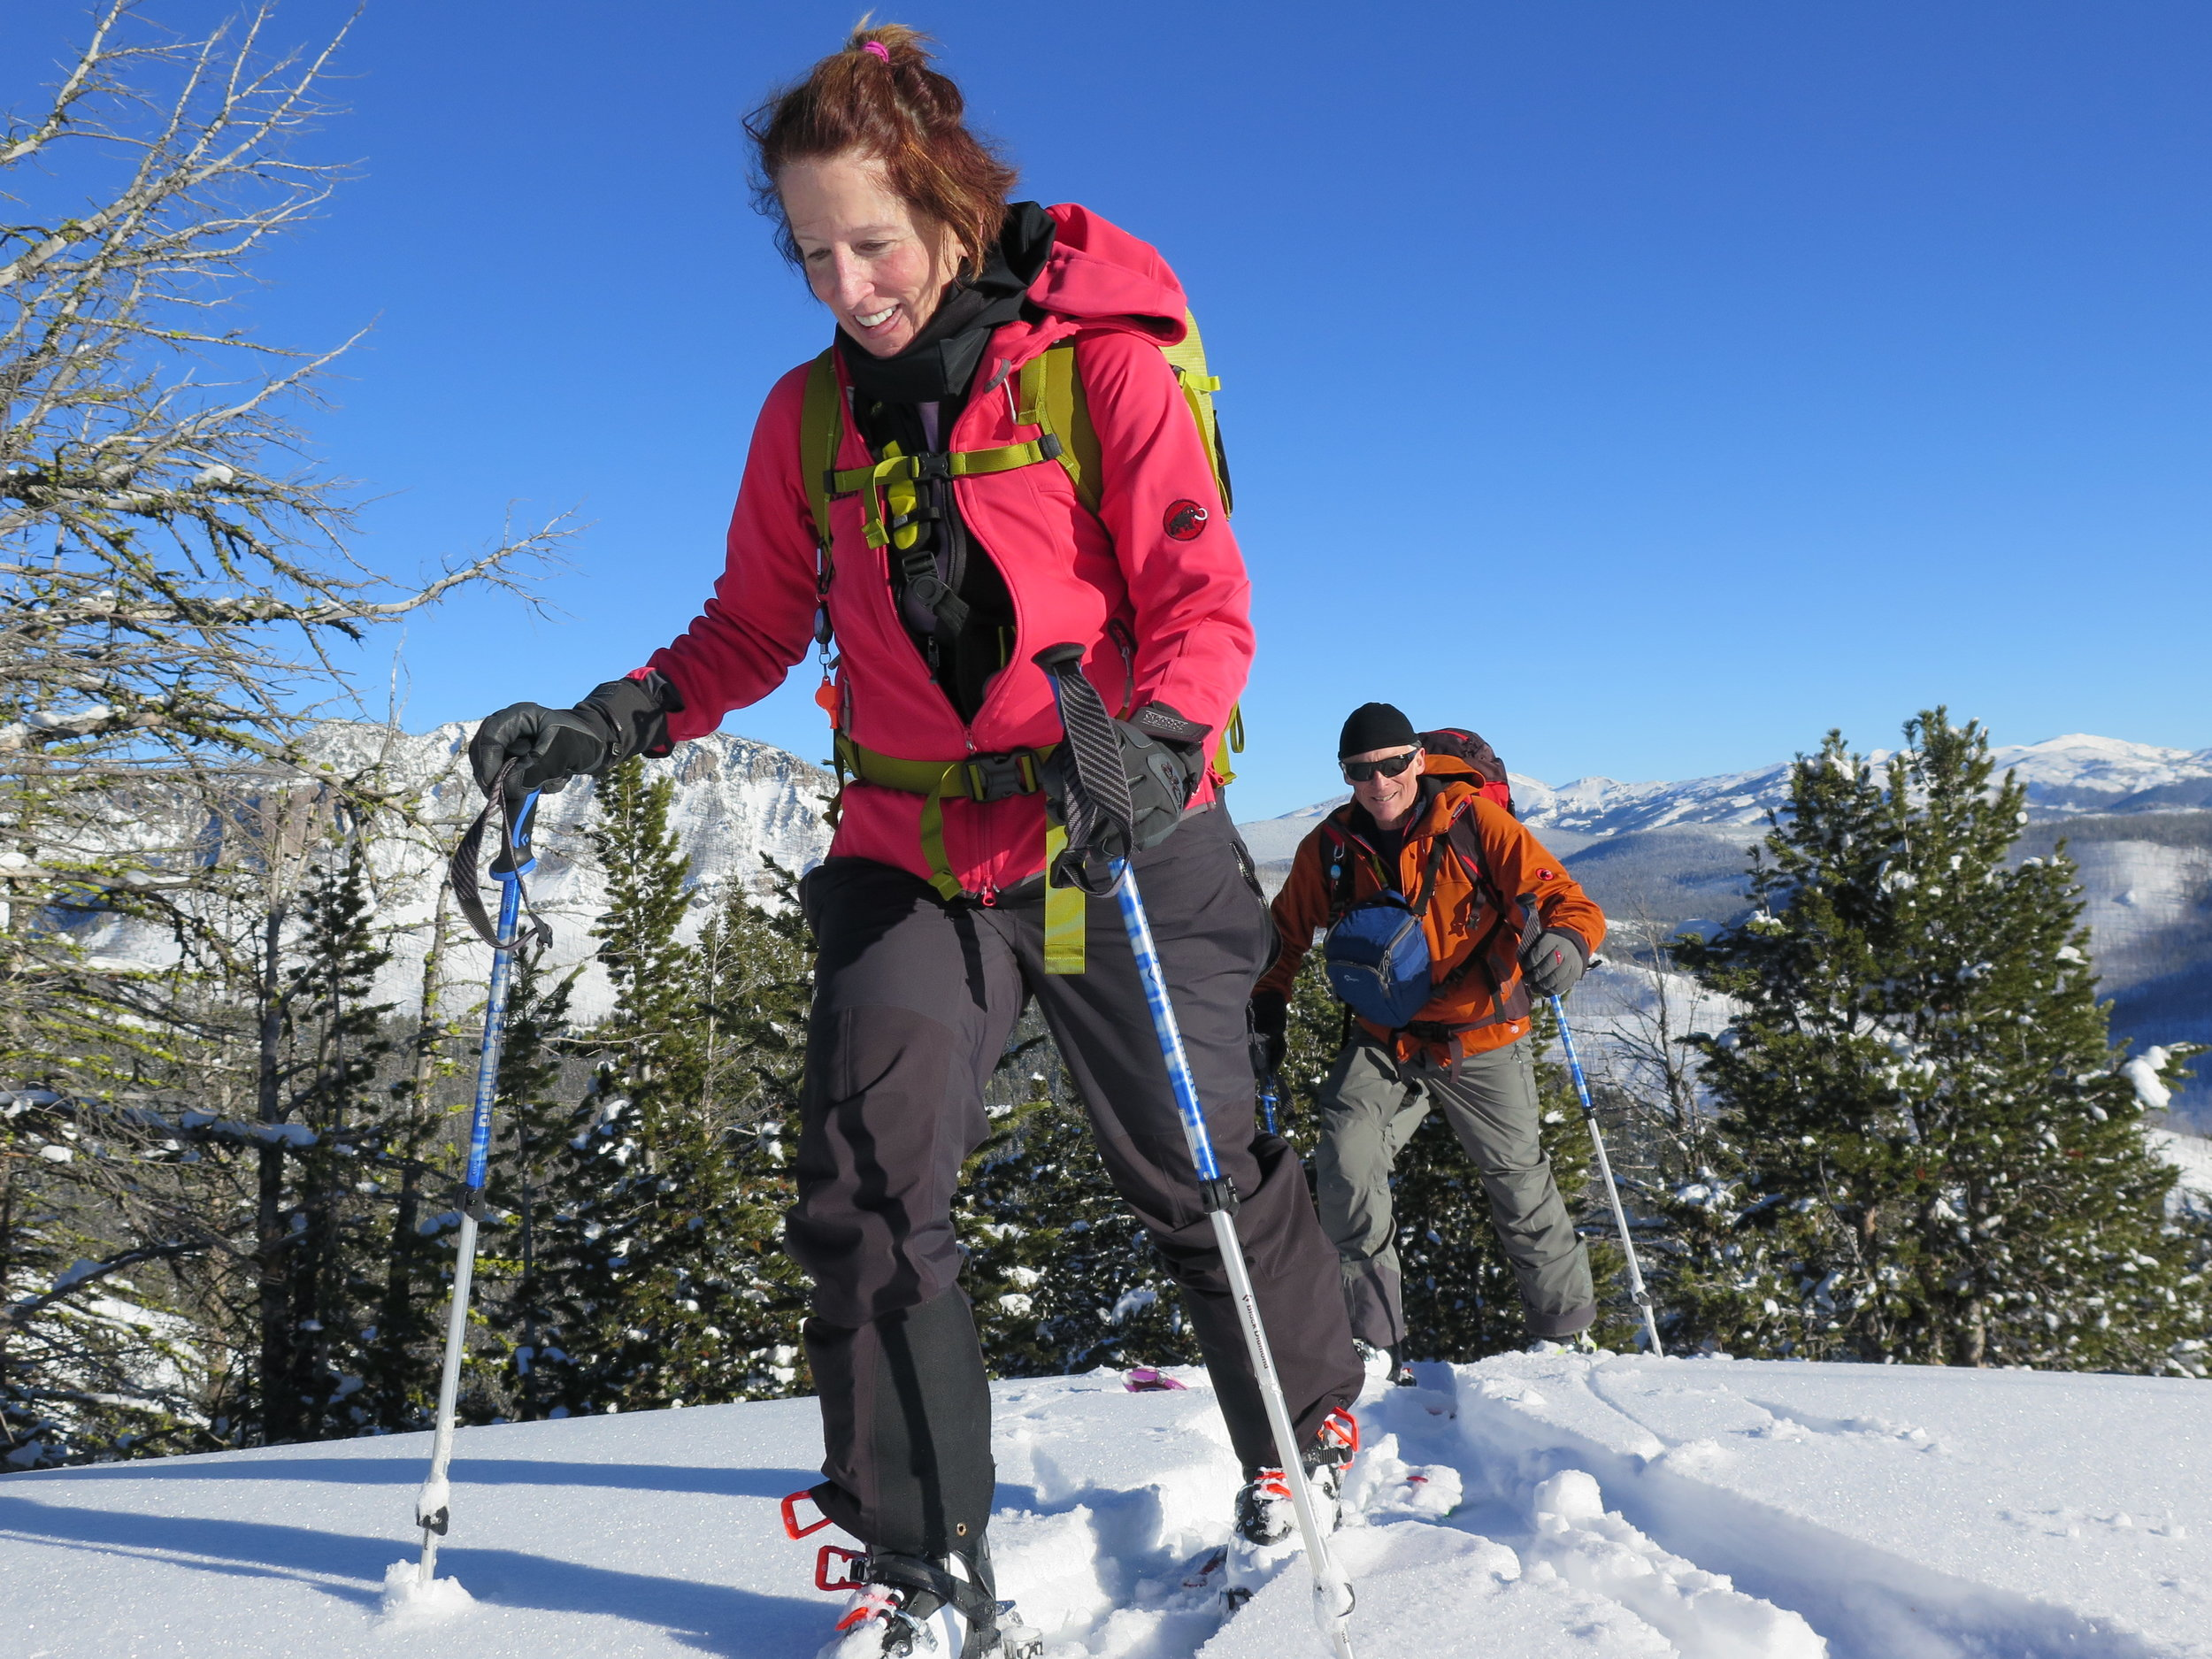 Bozeman Backcountry Skiing